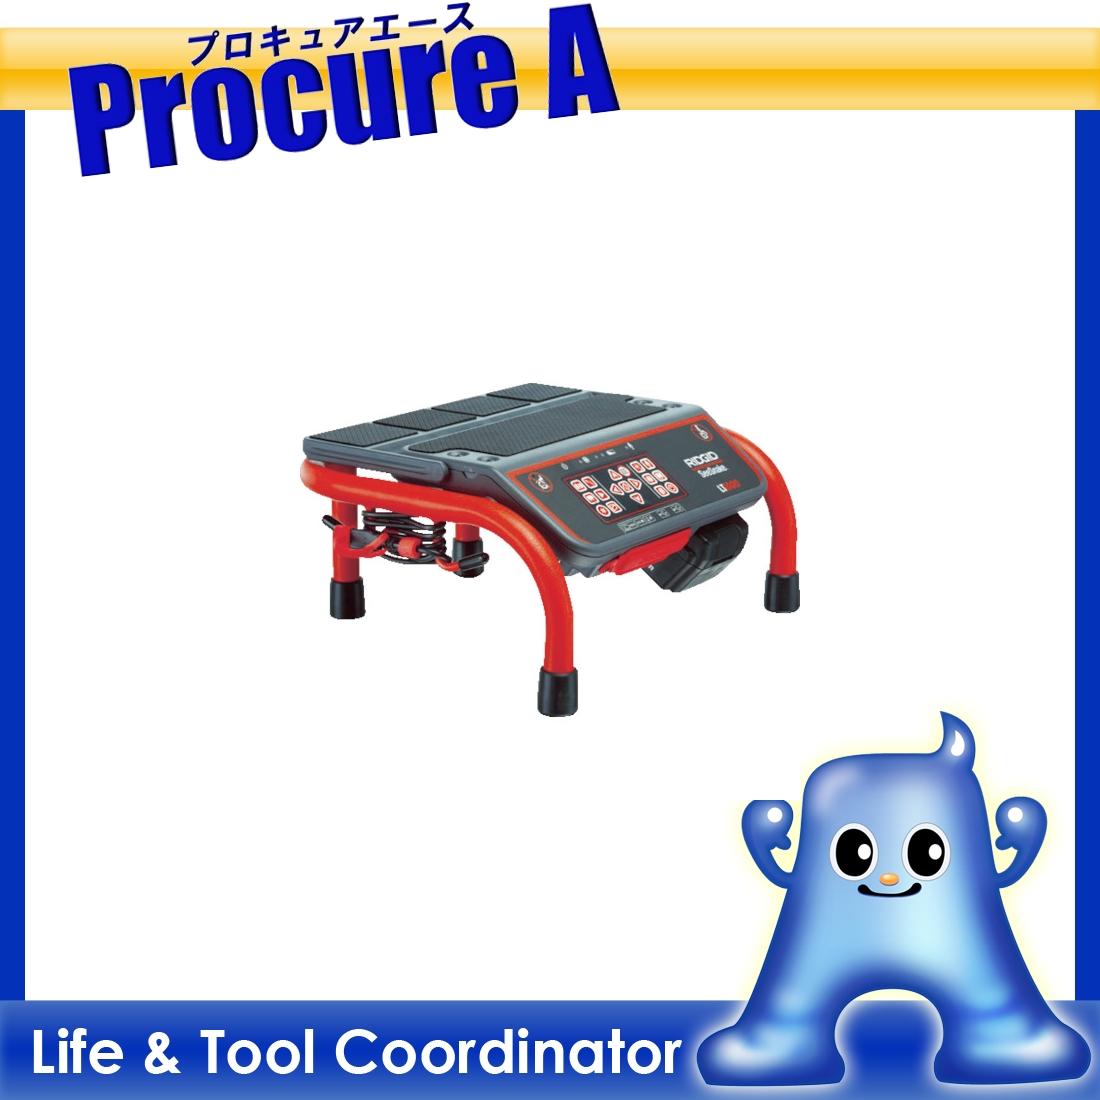 RIDGID ラップトップインターフェイスシステム LT1000M 36653 ▼495-0852 Ridge Tool Company